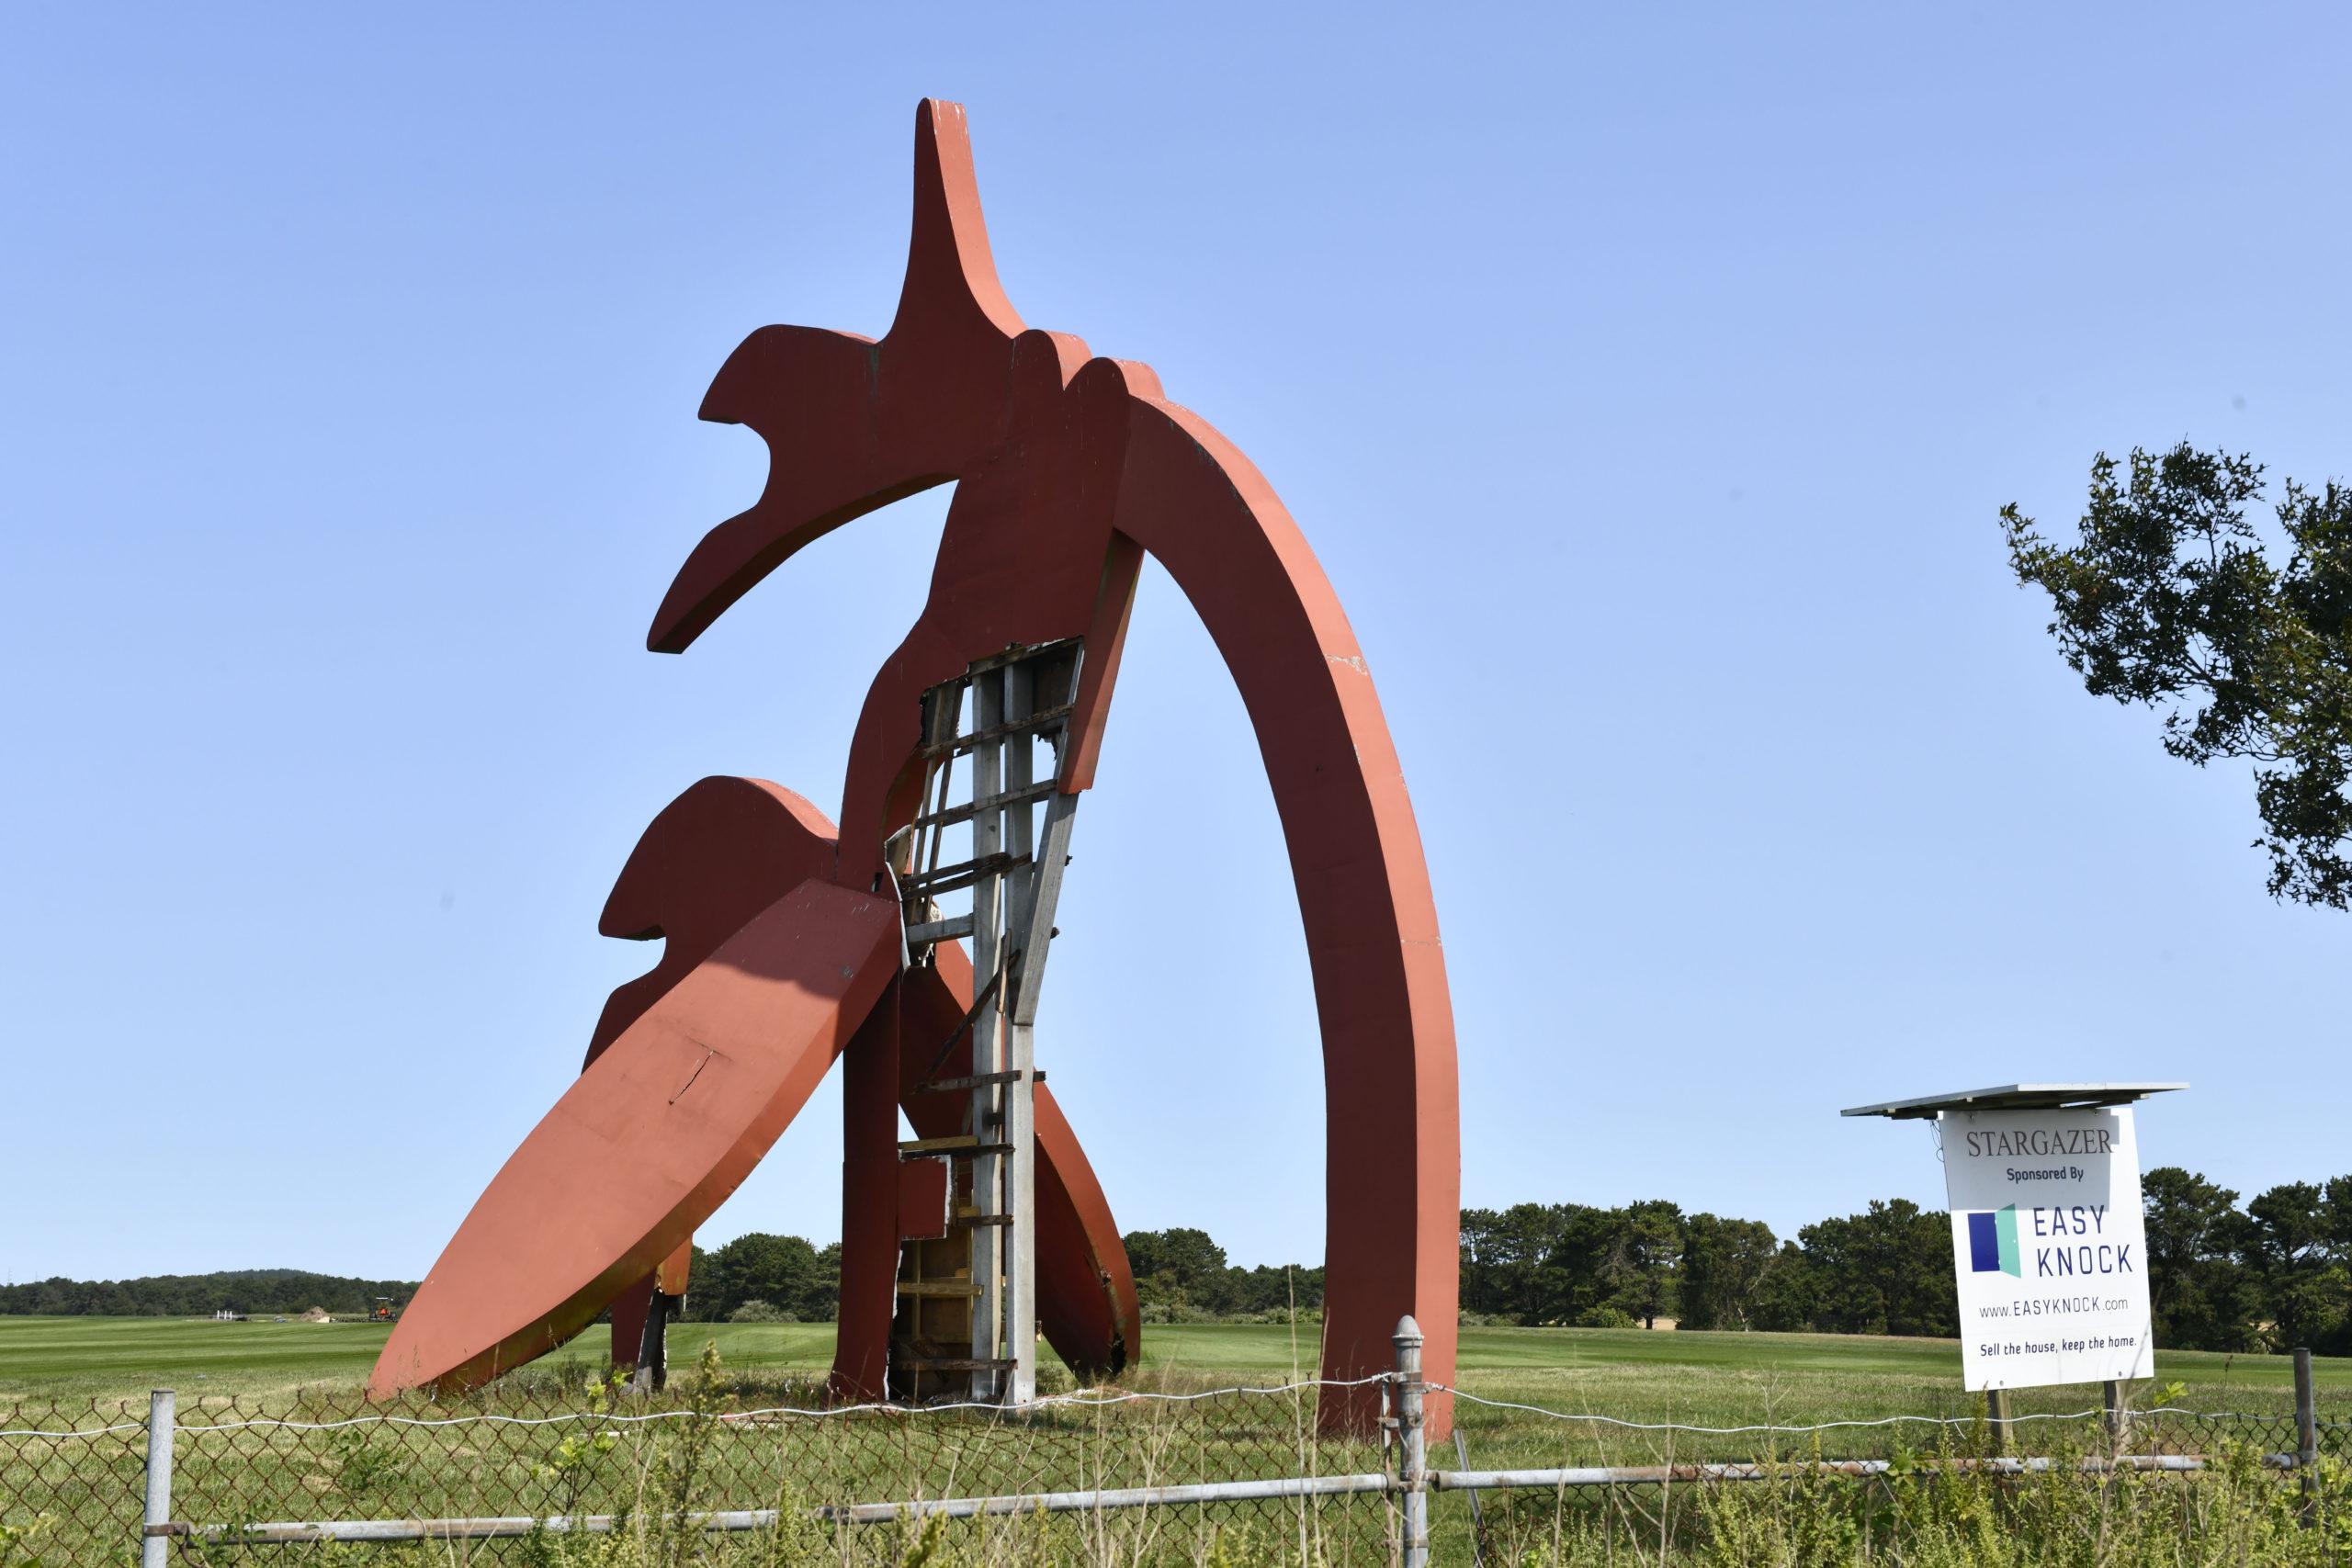 The Stargazer sculpture in Manorville is badly damaged.   DANA SHAW